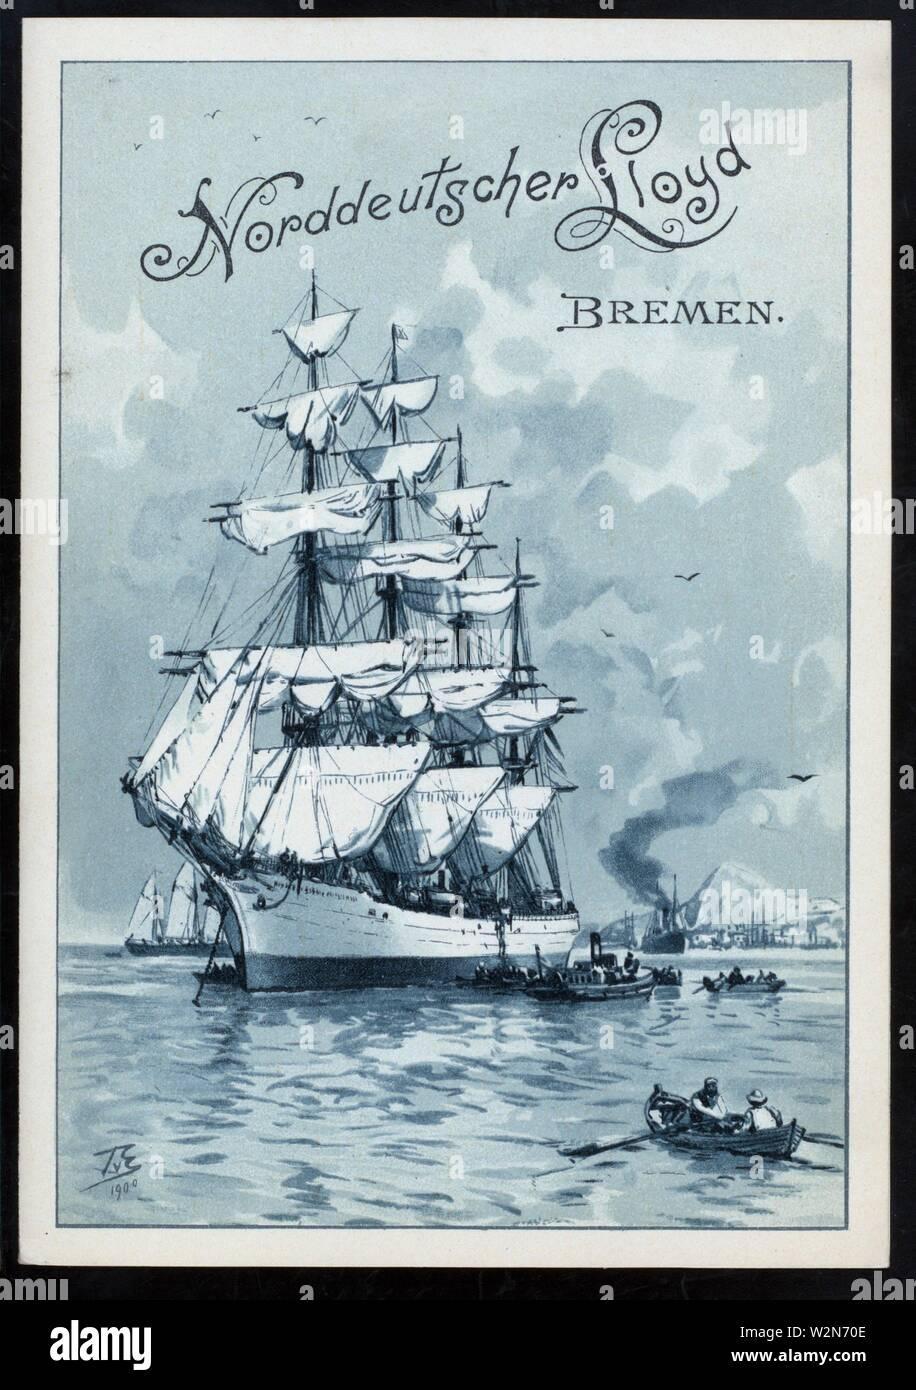 DINNER [held by] NORDDEUTSCHER LLOYD BREMEN [at] SS FRIEDRICH DER GROSSE (SS;). Buttolph, Frank E., Miss (d. 1924) (Collector). The Buttolph - Stock Image